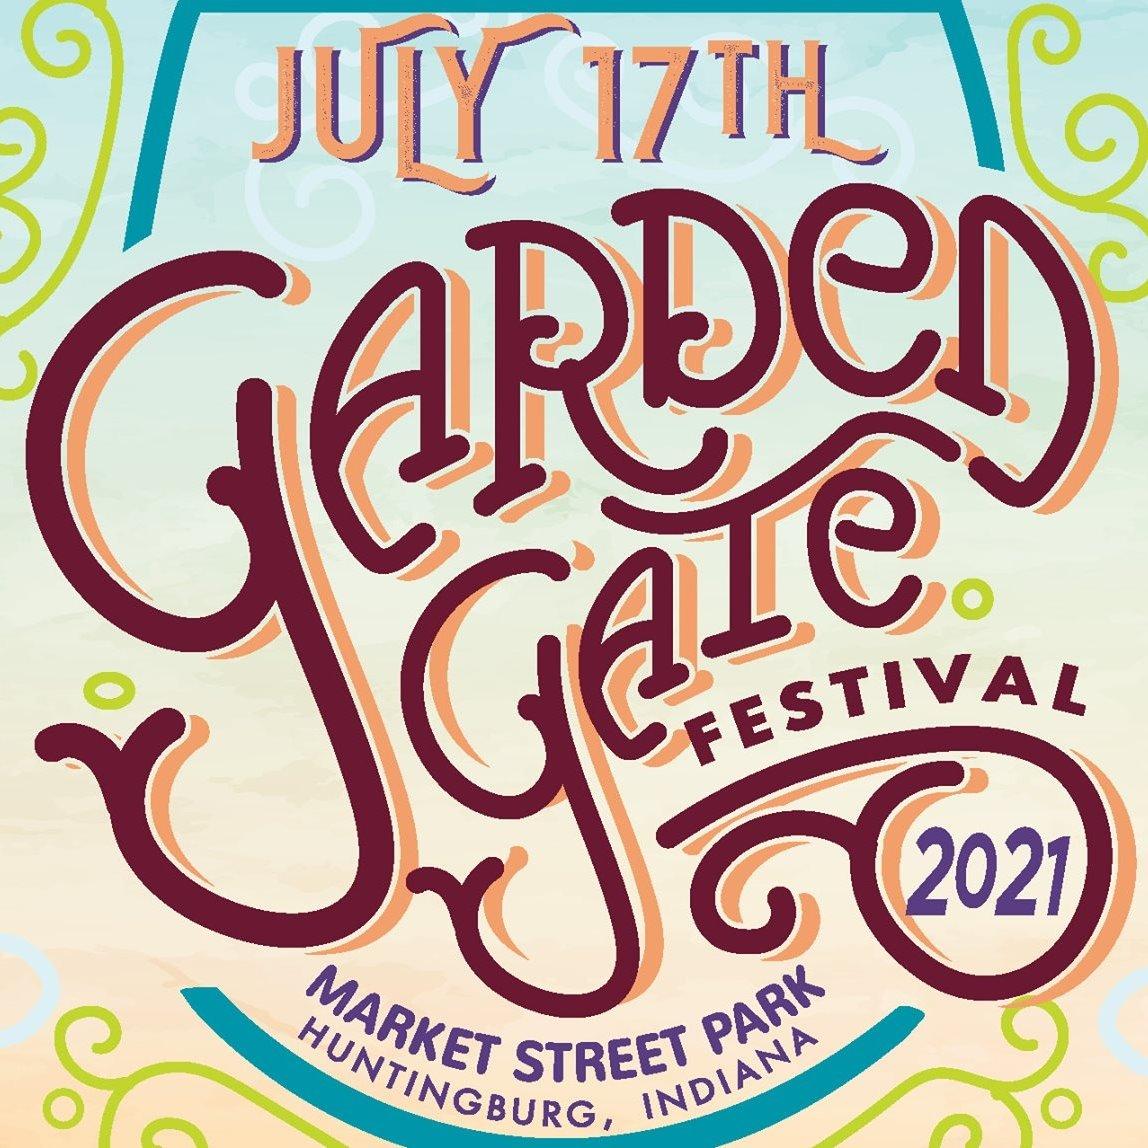 Garden Gate Festival Returns July 17th in Huntingburg